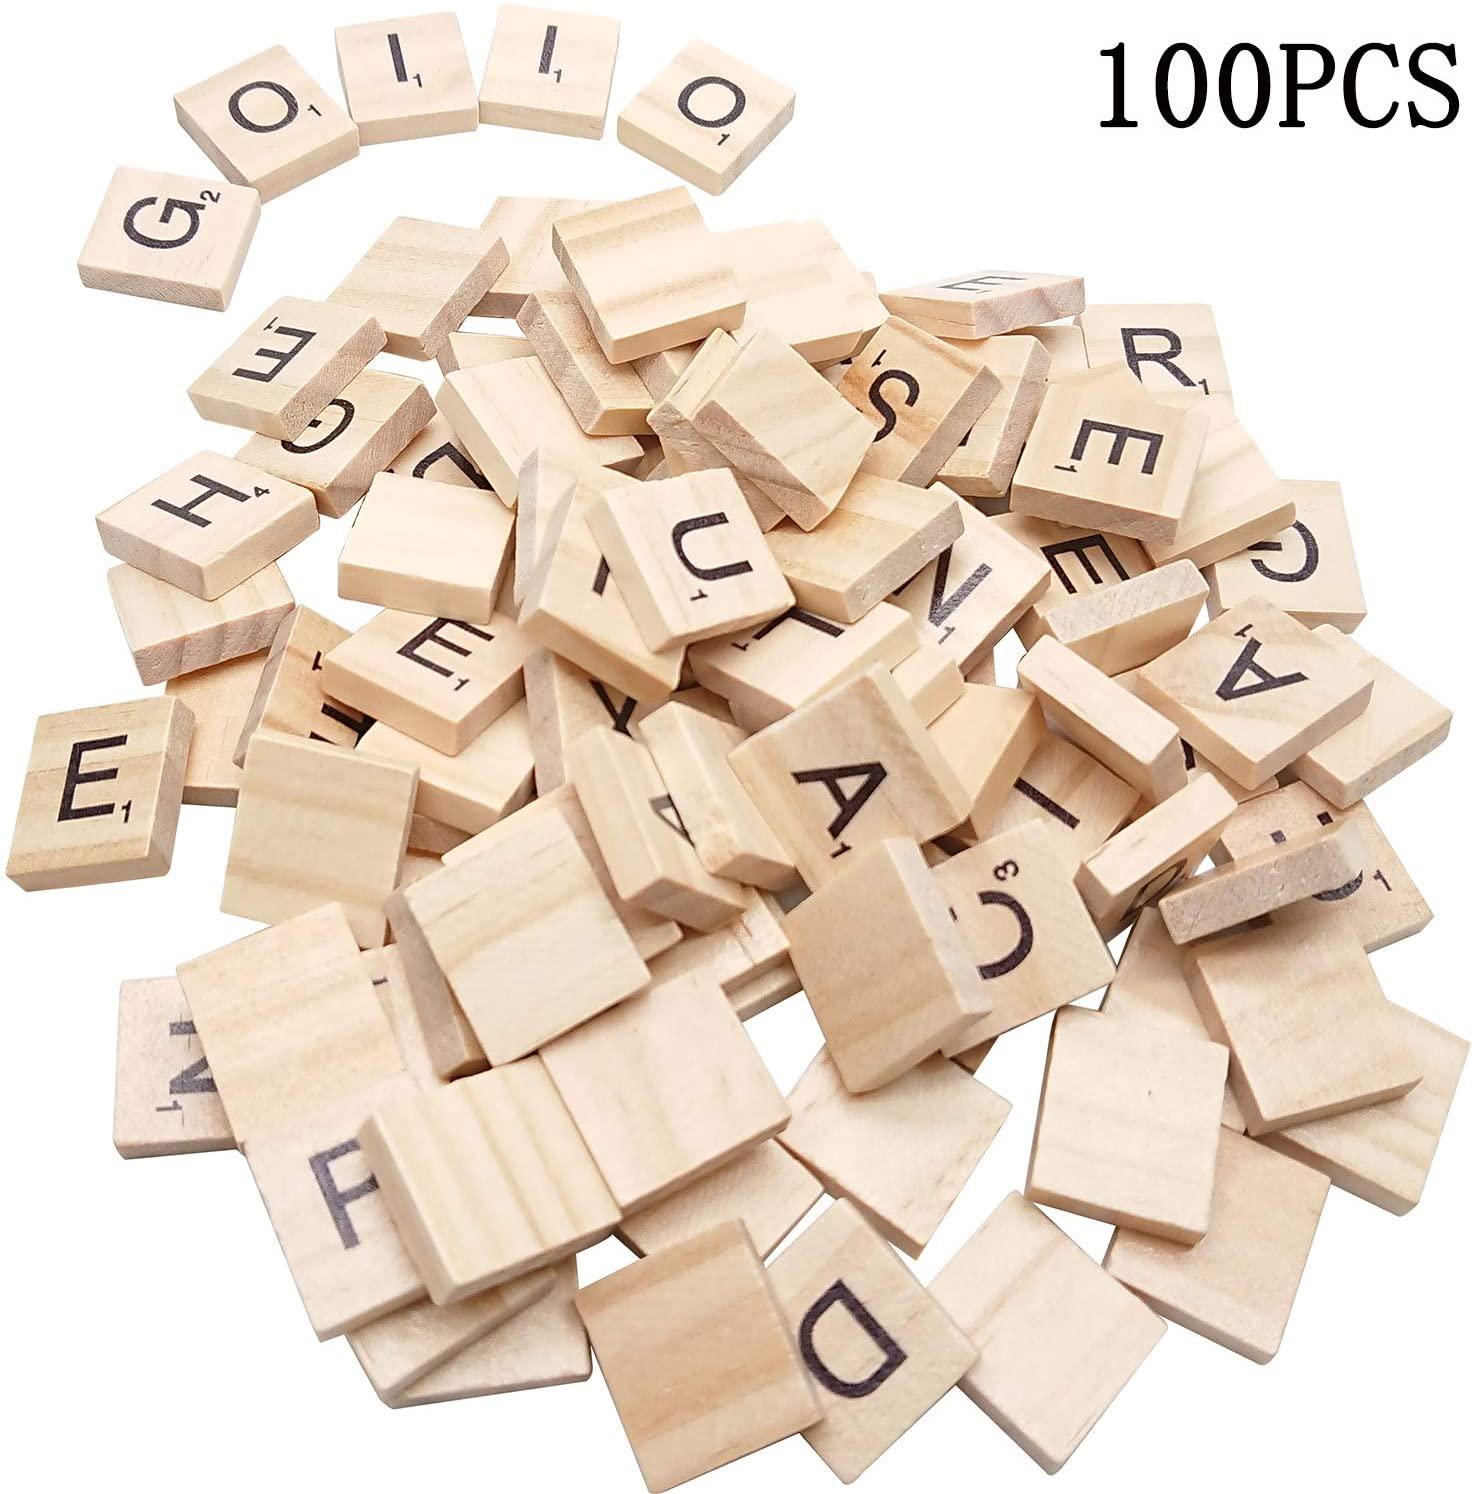 Goiio 100PCS Scrabble Letters, DIY Making Scrabble Crossword Game,Wood Scrabble Tiles